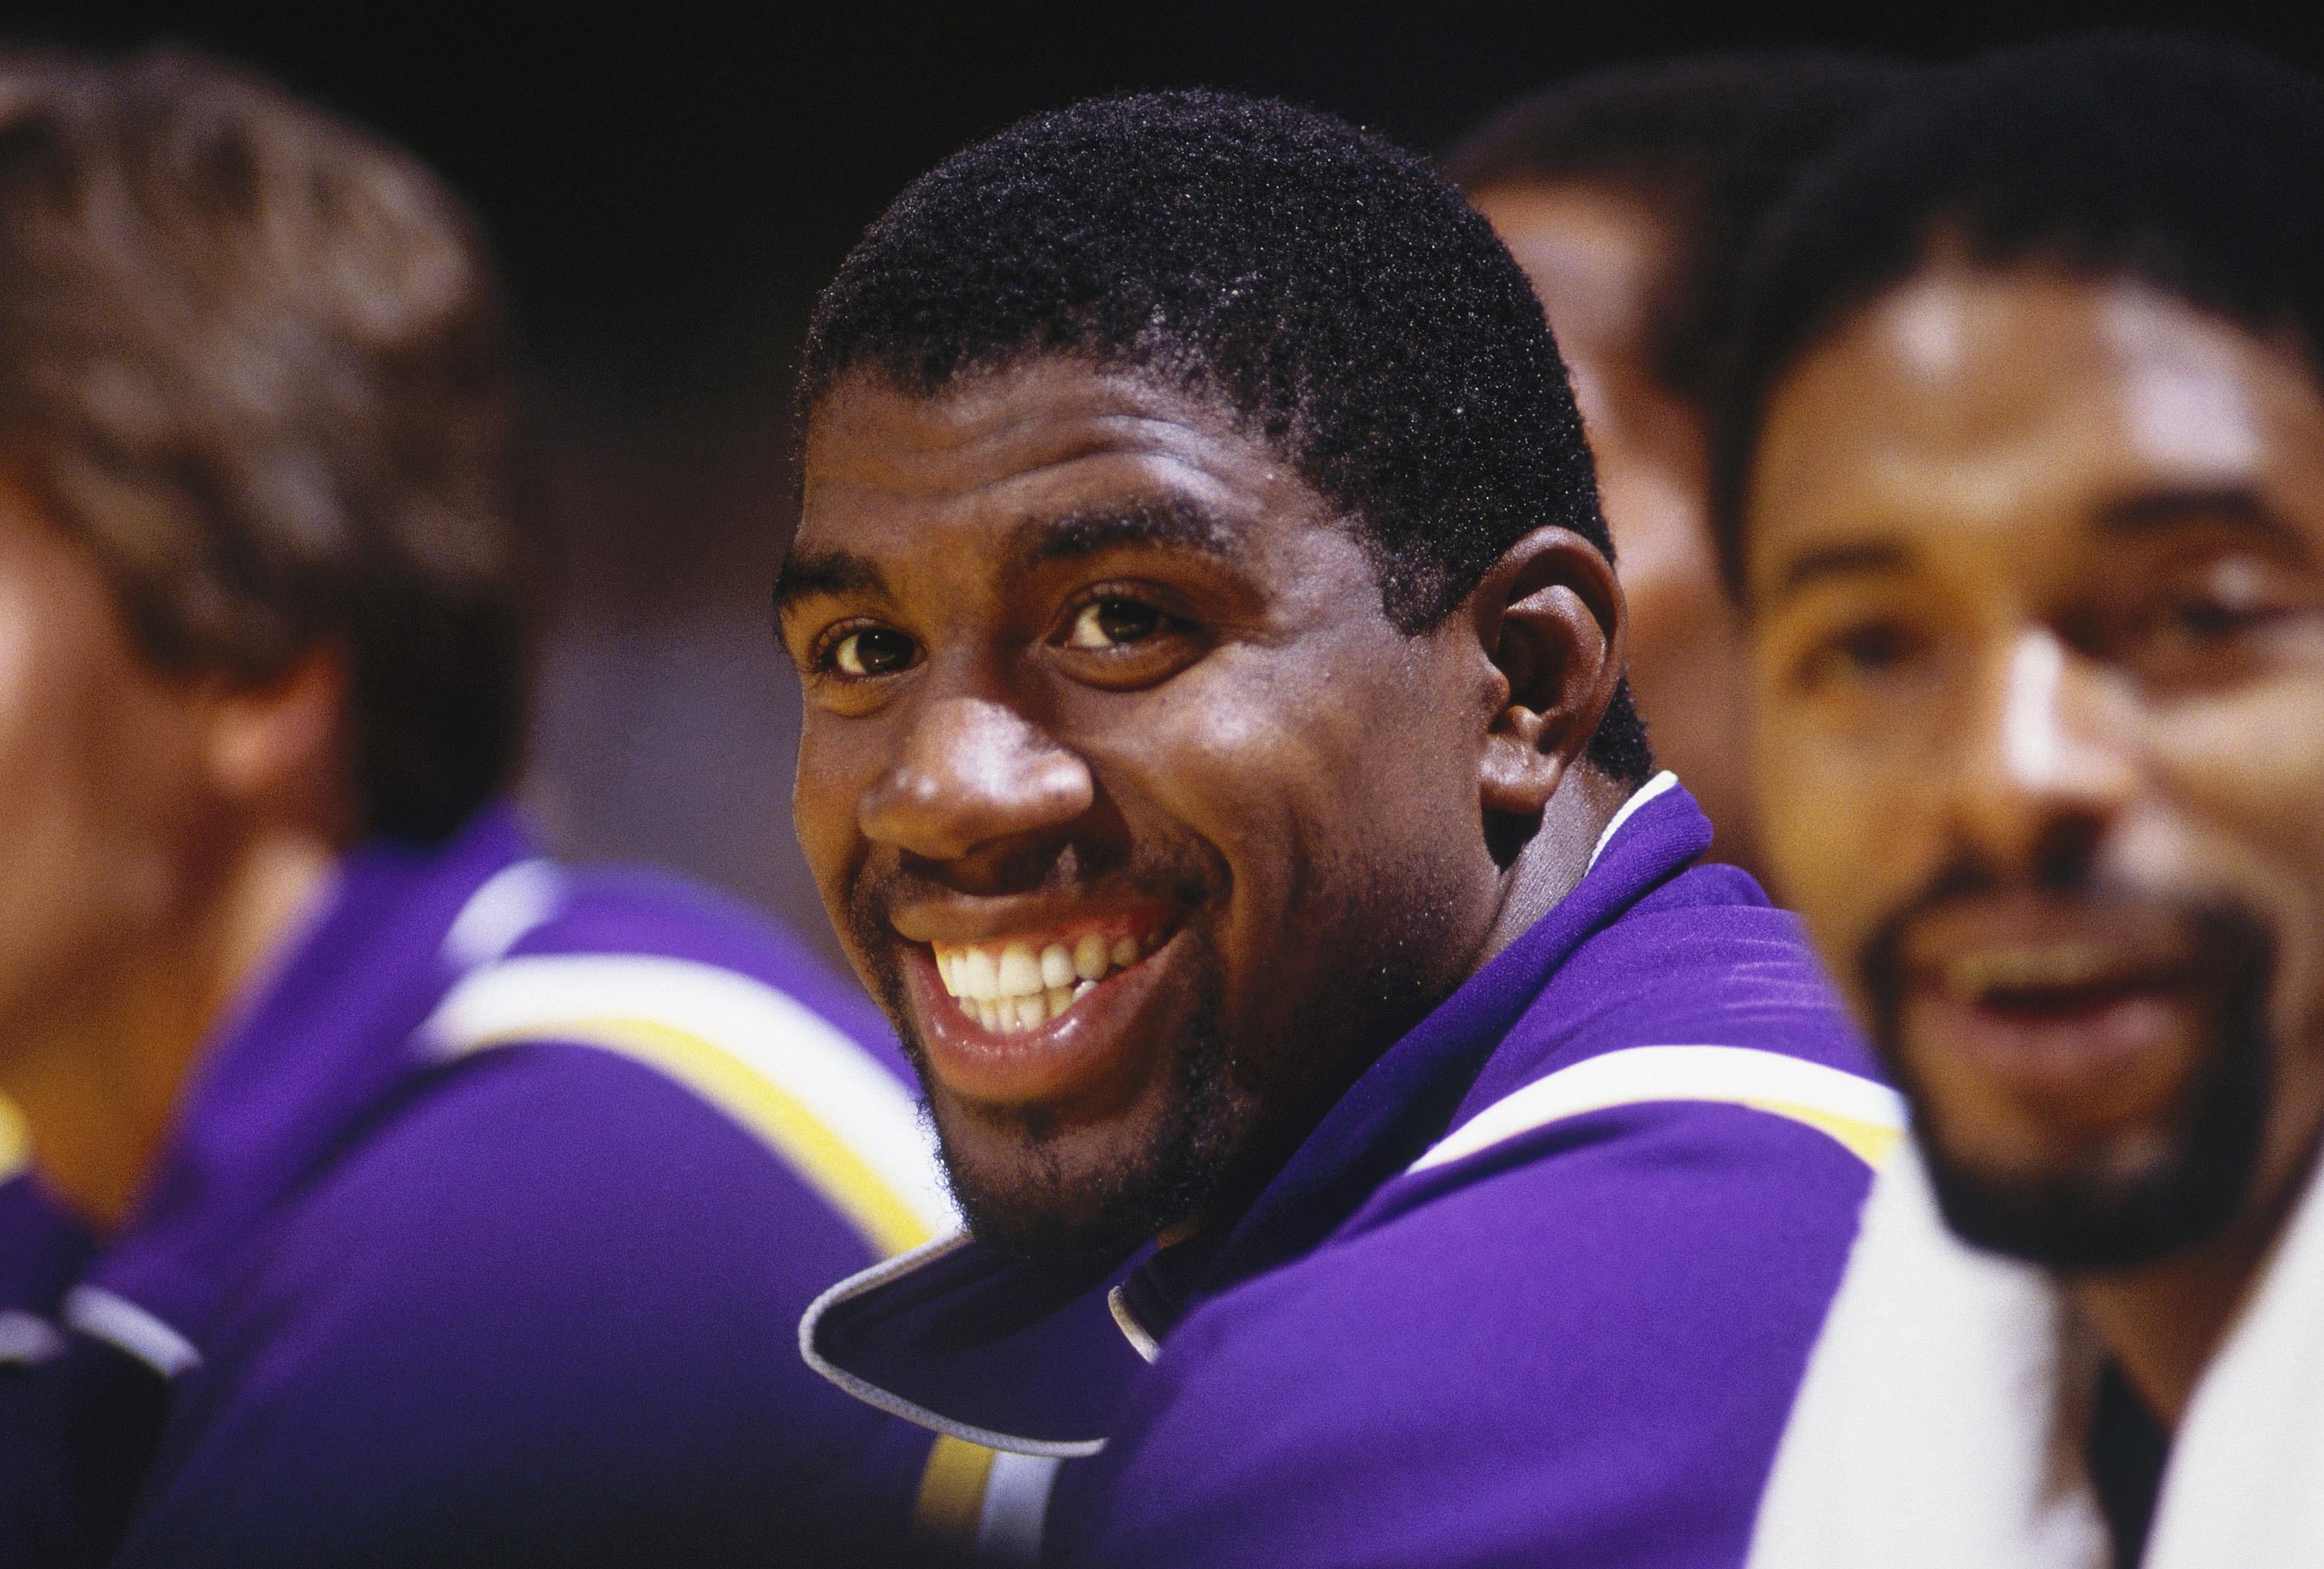 How Did Magic Johnson Get His Iconic Nickname?